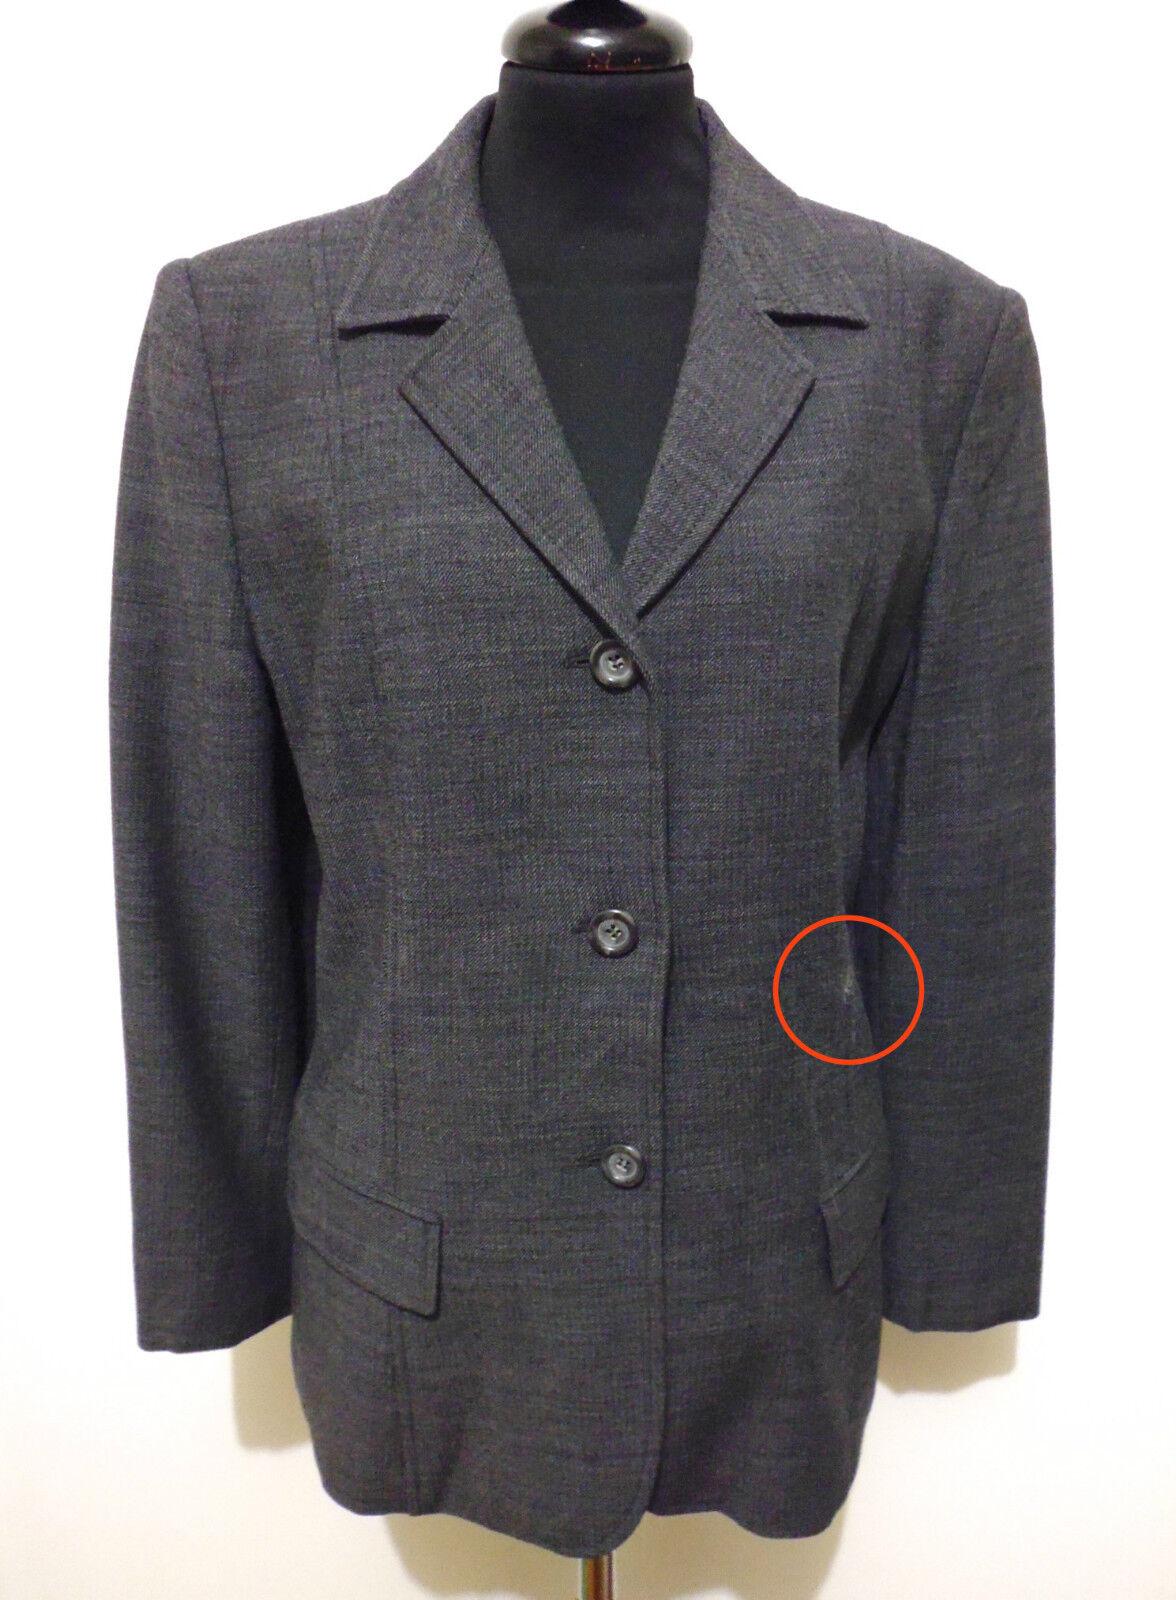 MARELLA Damenjacke Wolle Woman Jacket Blazer GR.M - 44